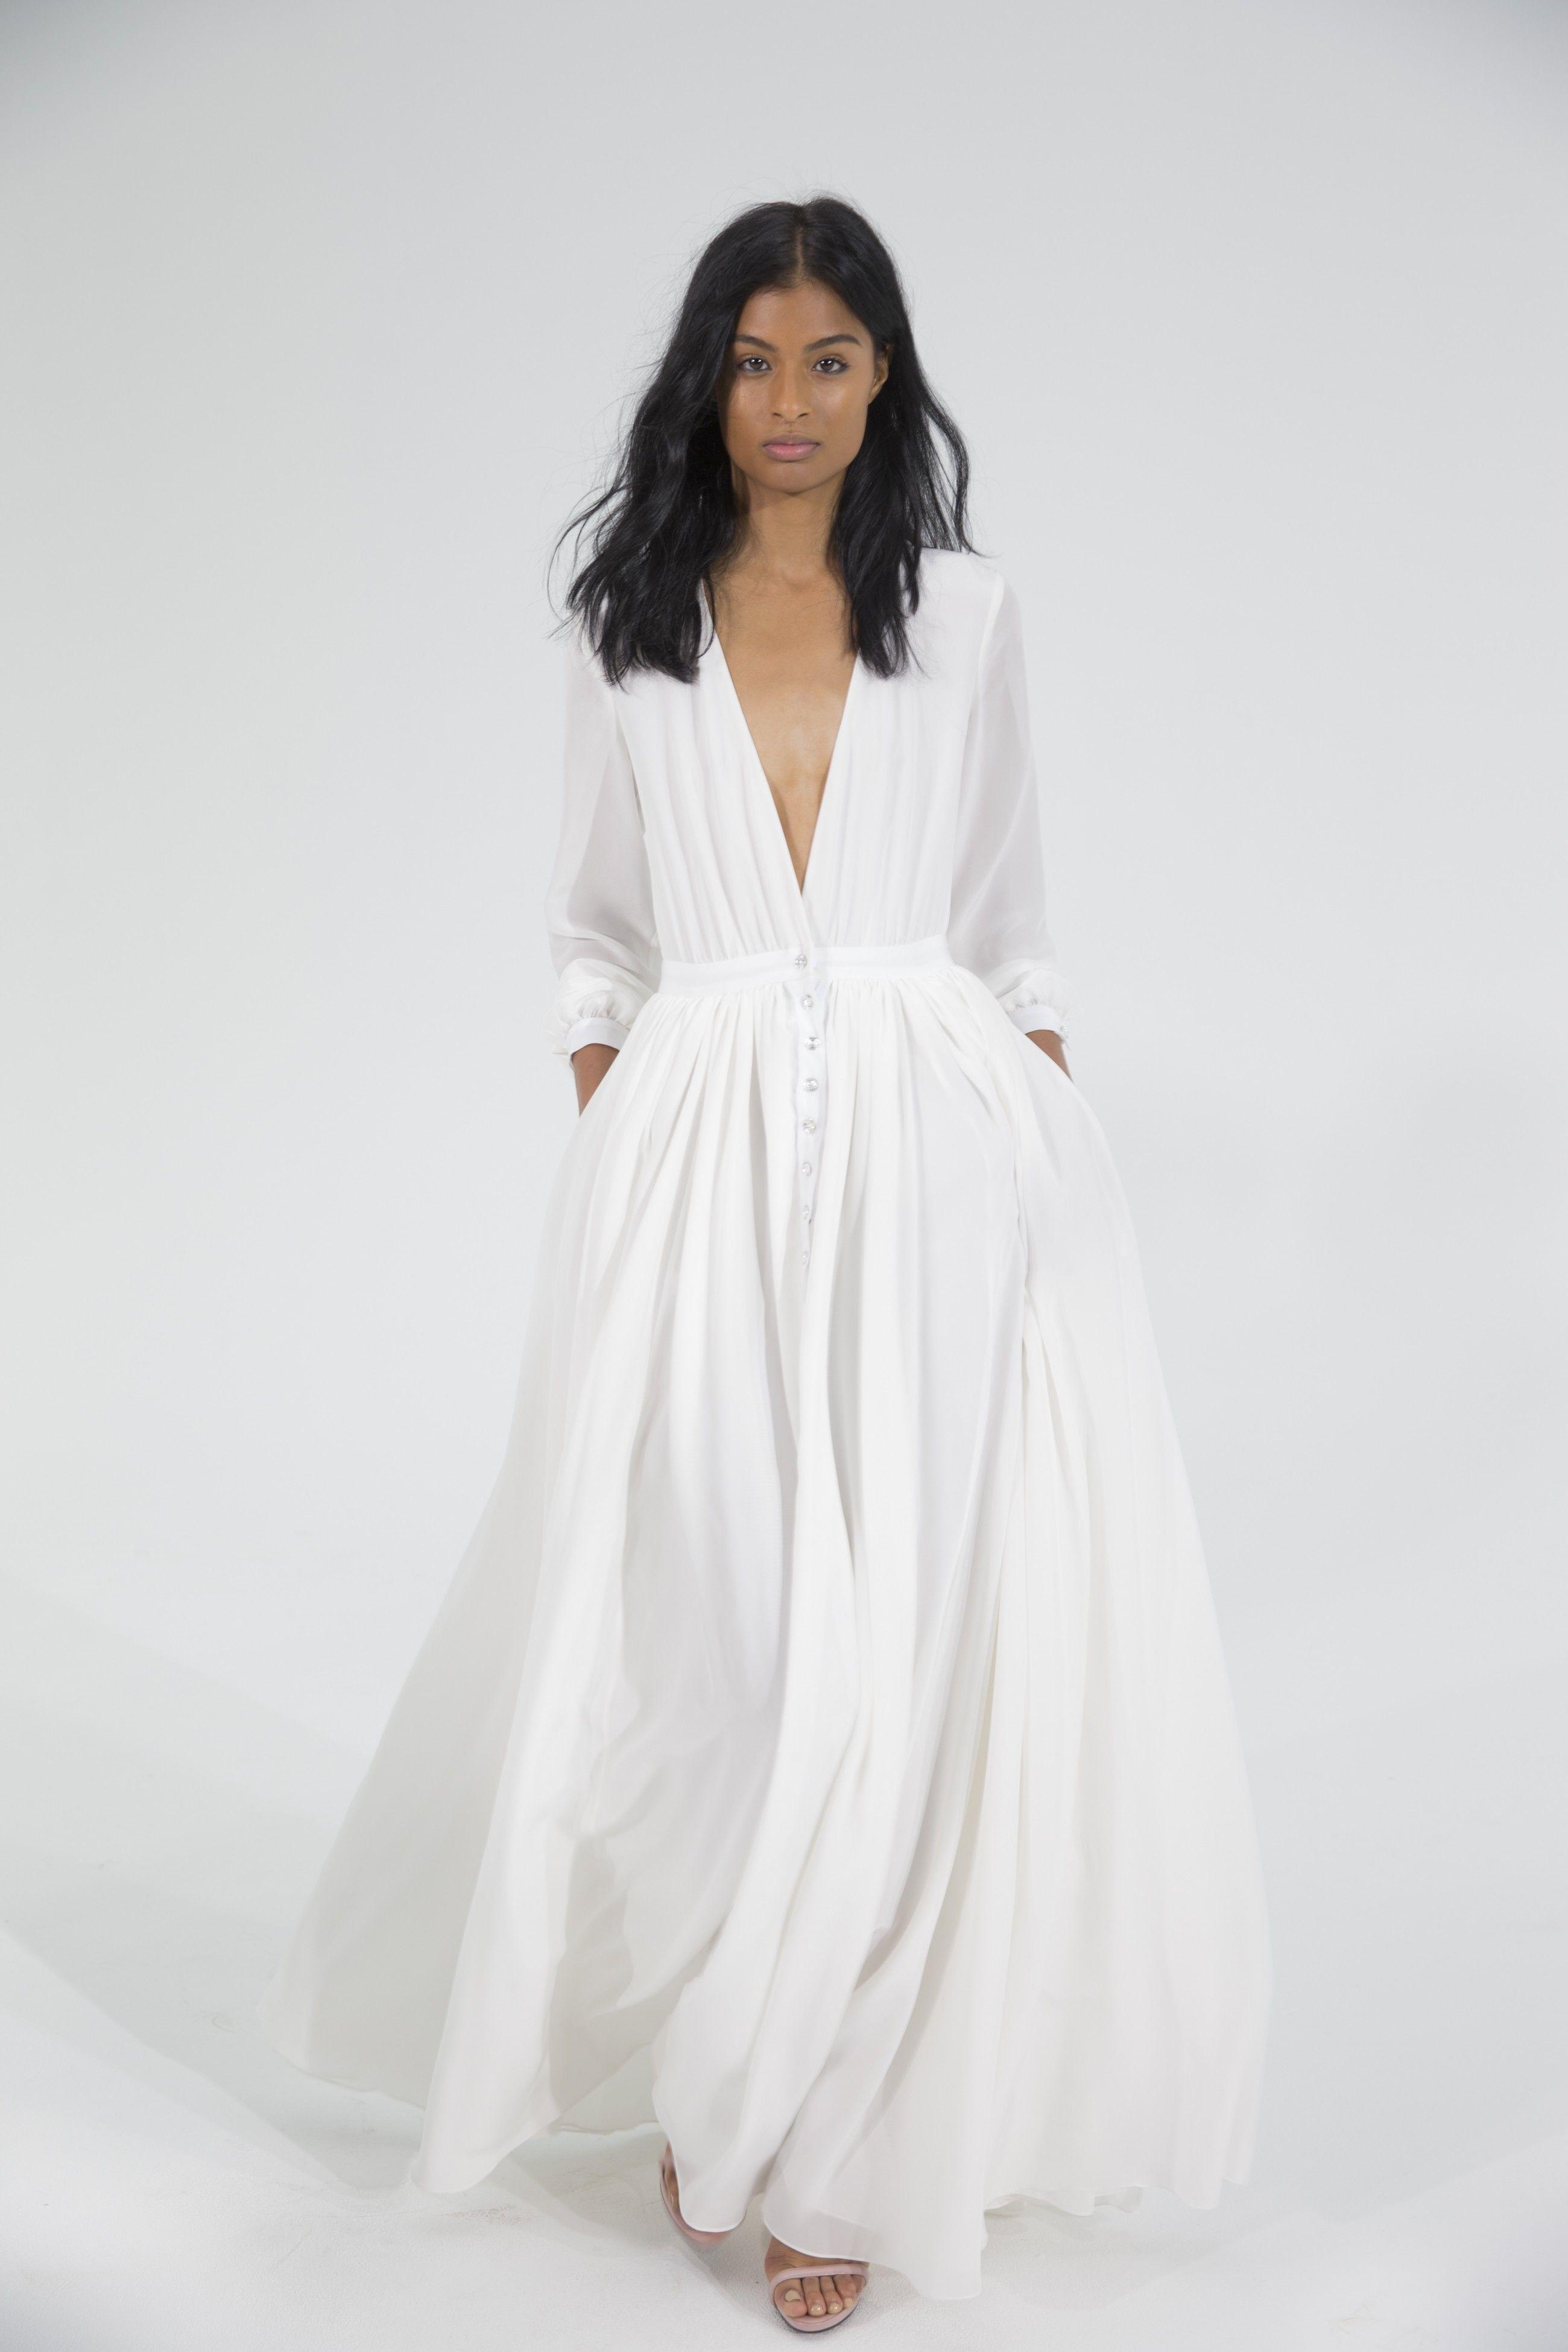 2950 houghton galina dress fabric silk crepe de chine wedding 2950 houghton galina dress fabric silk crepe de chine ombrellifo Gallery